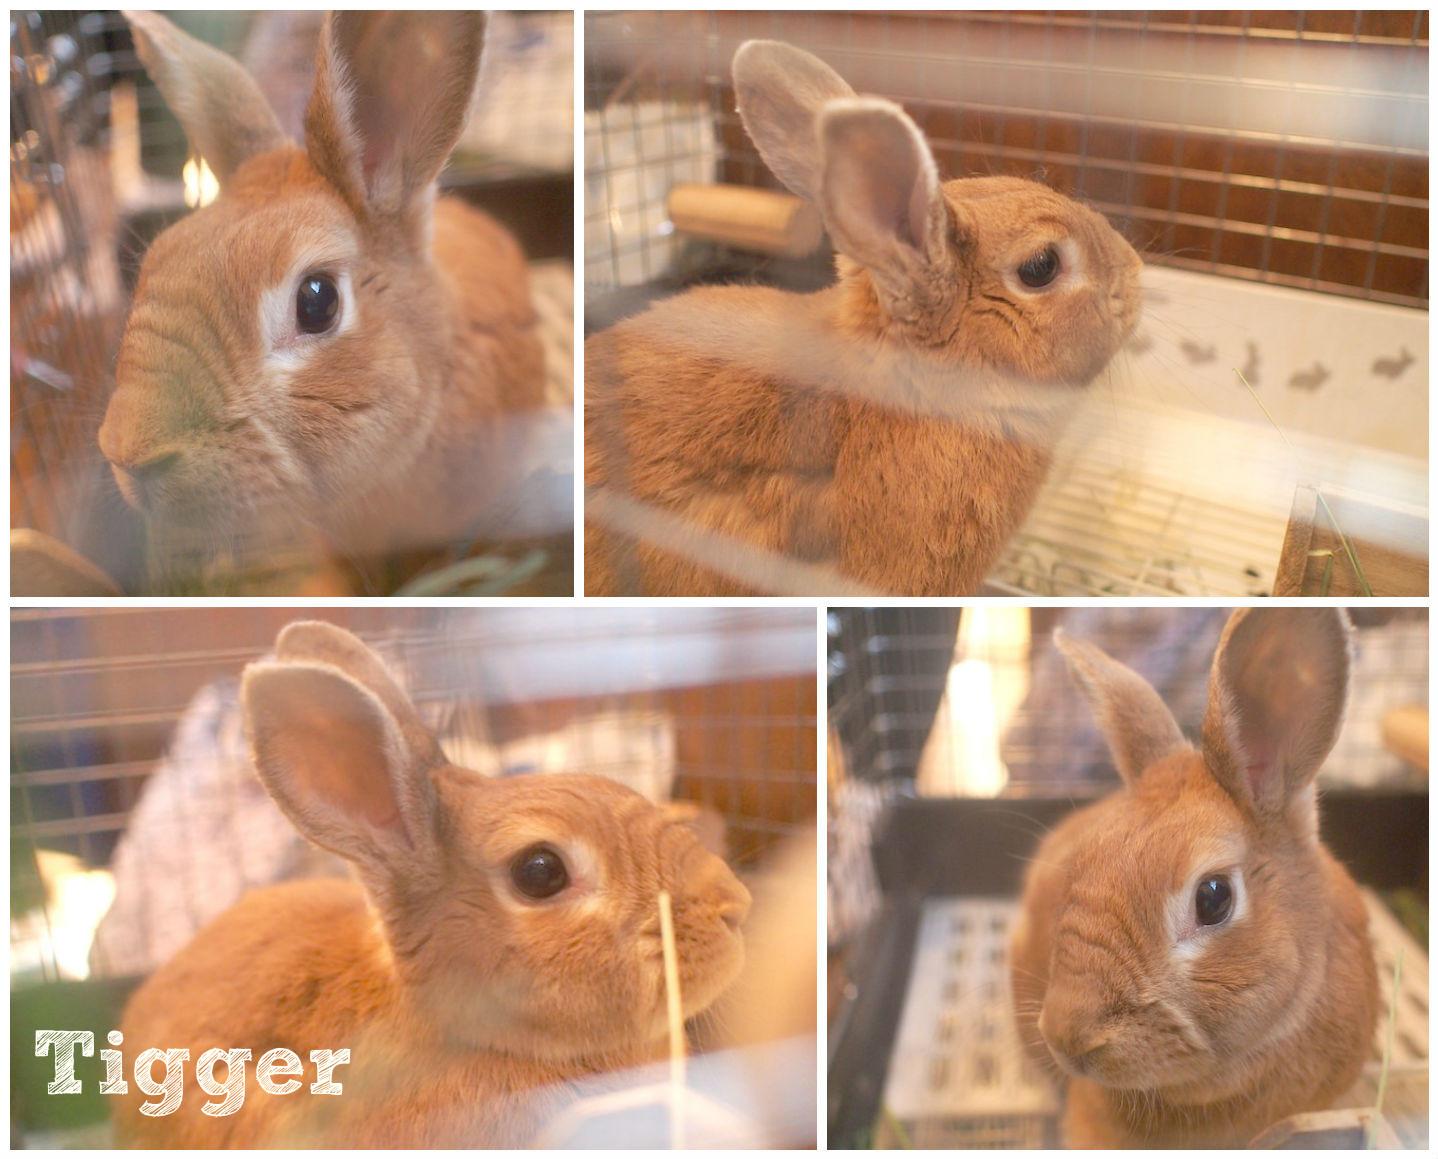 tiggerFotorCreated.jpg